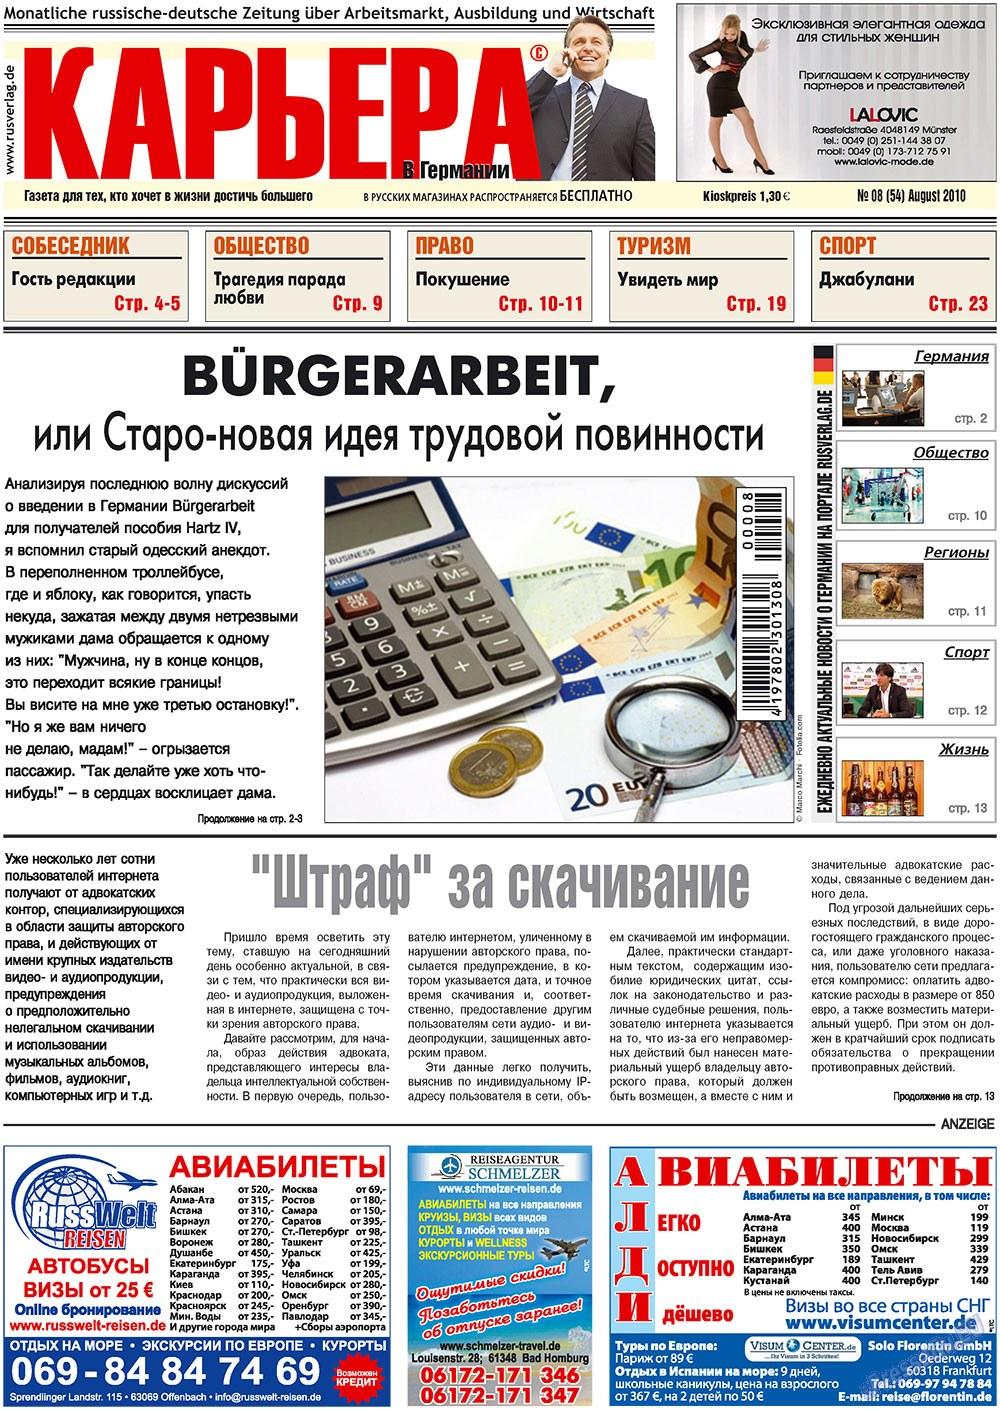 Карьера (газета). 2010 год, номер 8, стр. 1